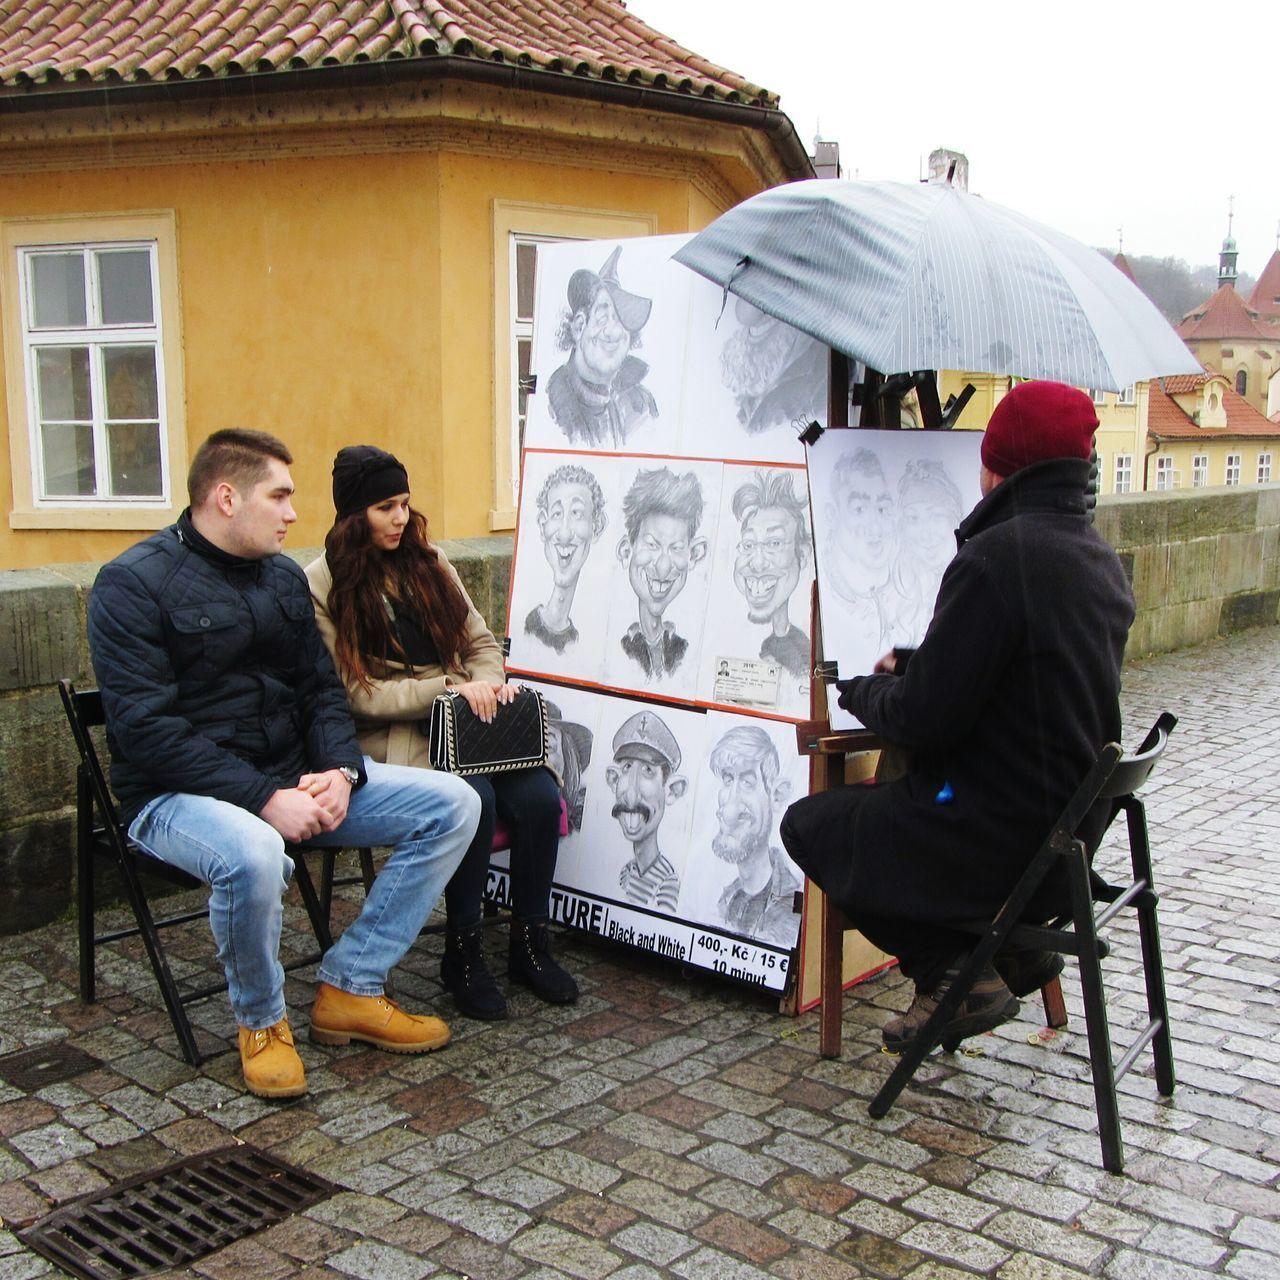 Caricaturist Charles Bridge Prague Artist Street Art People Sitting Umbrella Wintertime Rainy Weather Caricatures Portraits